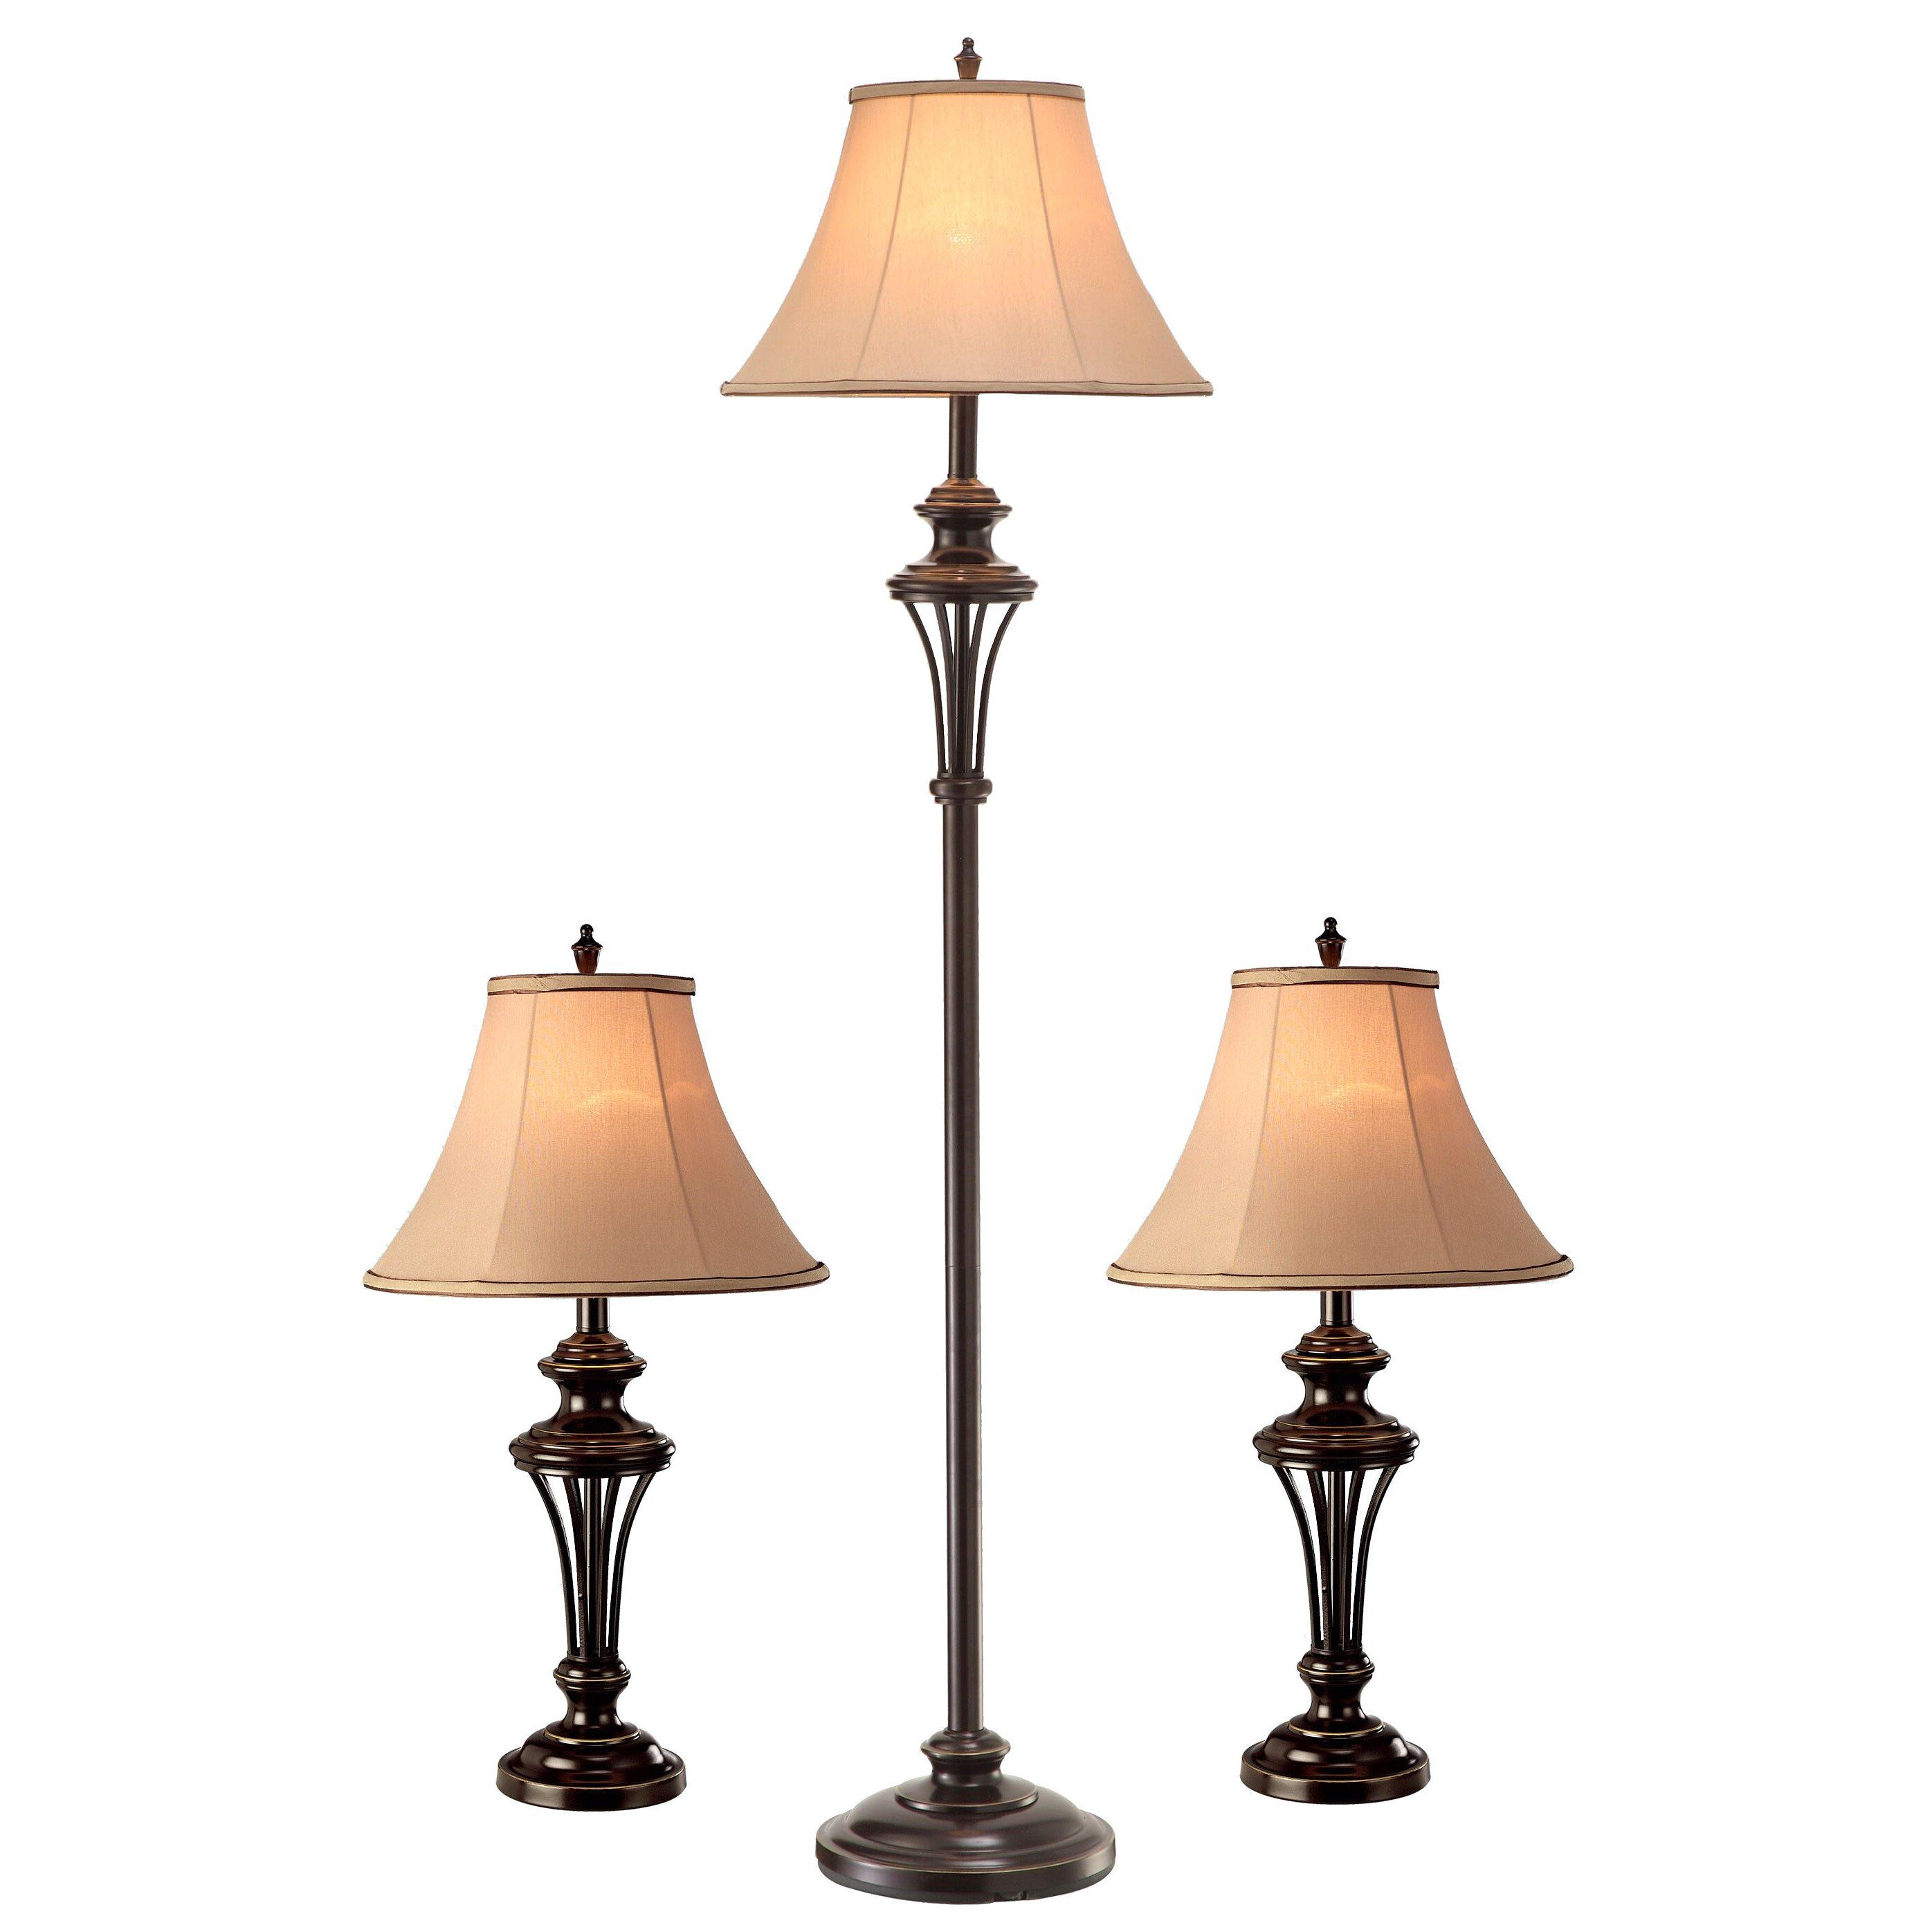 normandelighting 3 piece table and floor lamp set reviews wayfair. Black Bedroom Furniture Sets. Home Design Ideas